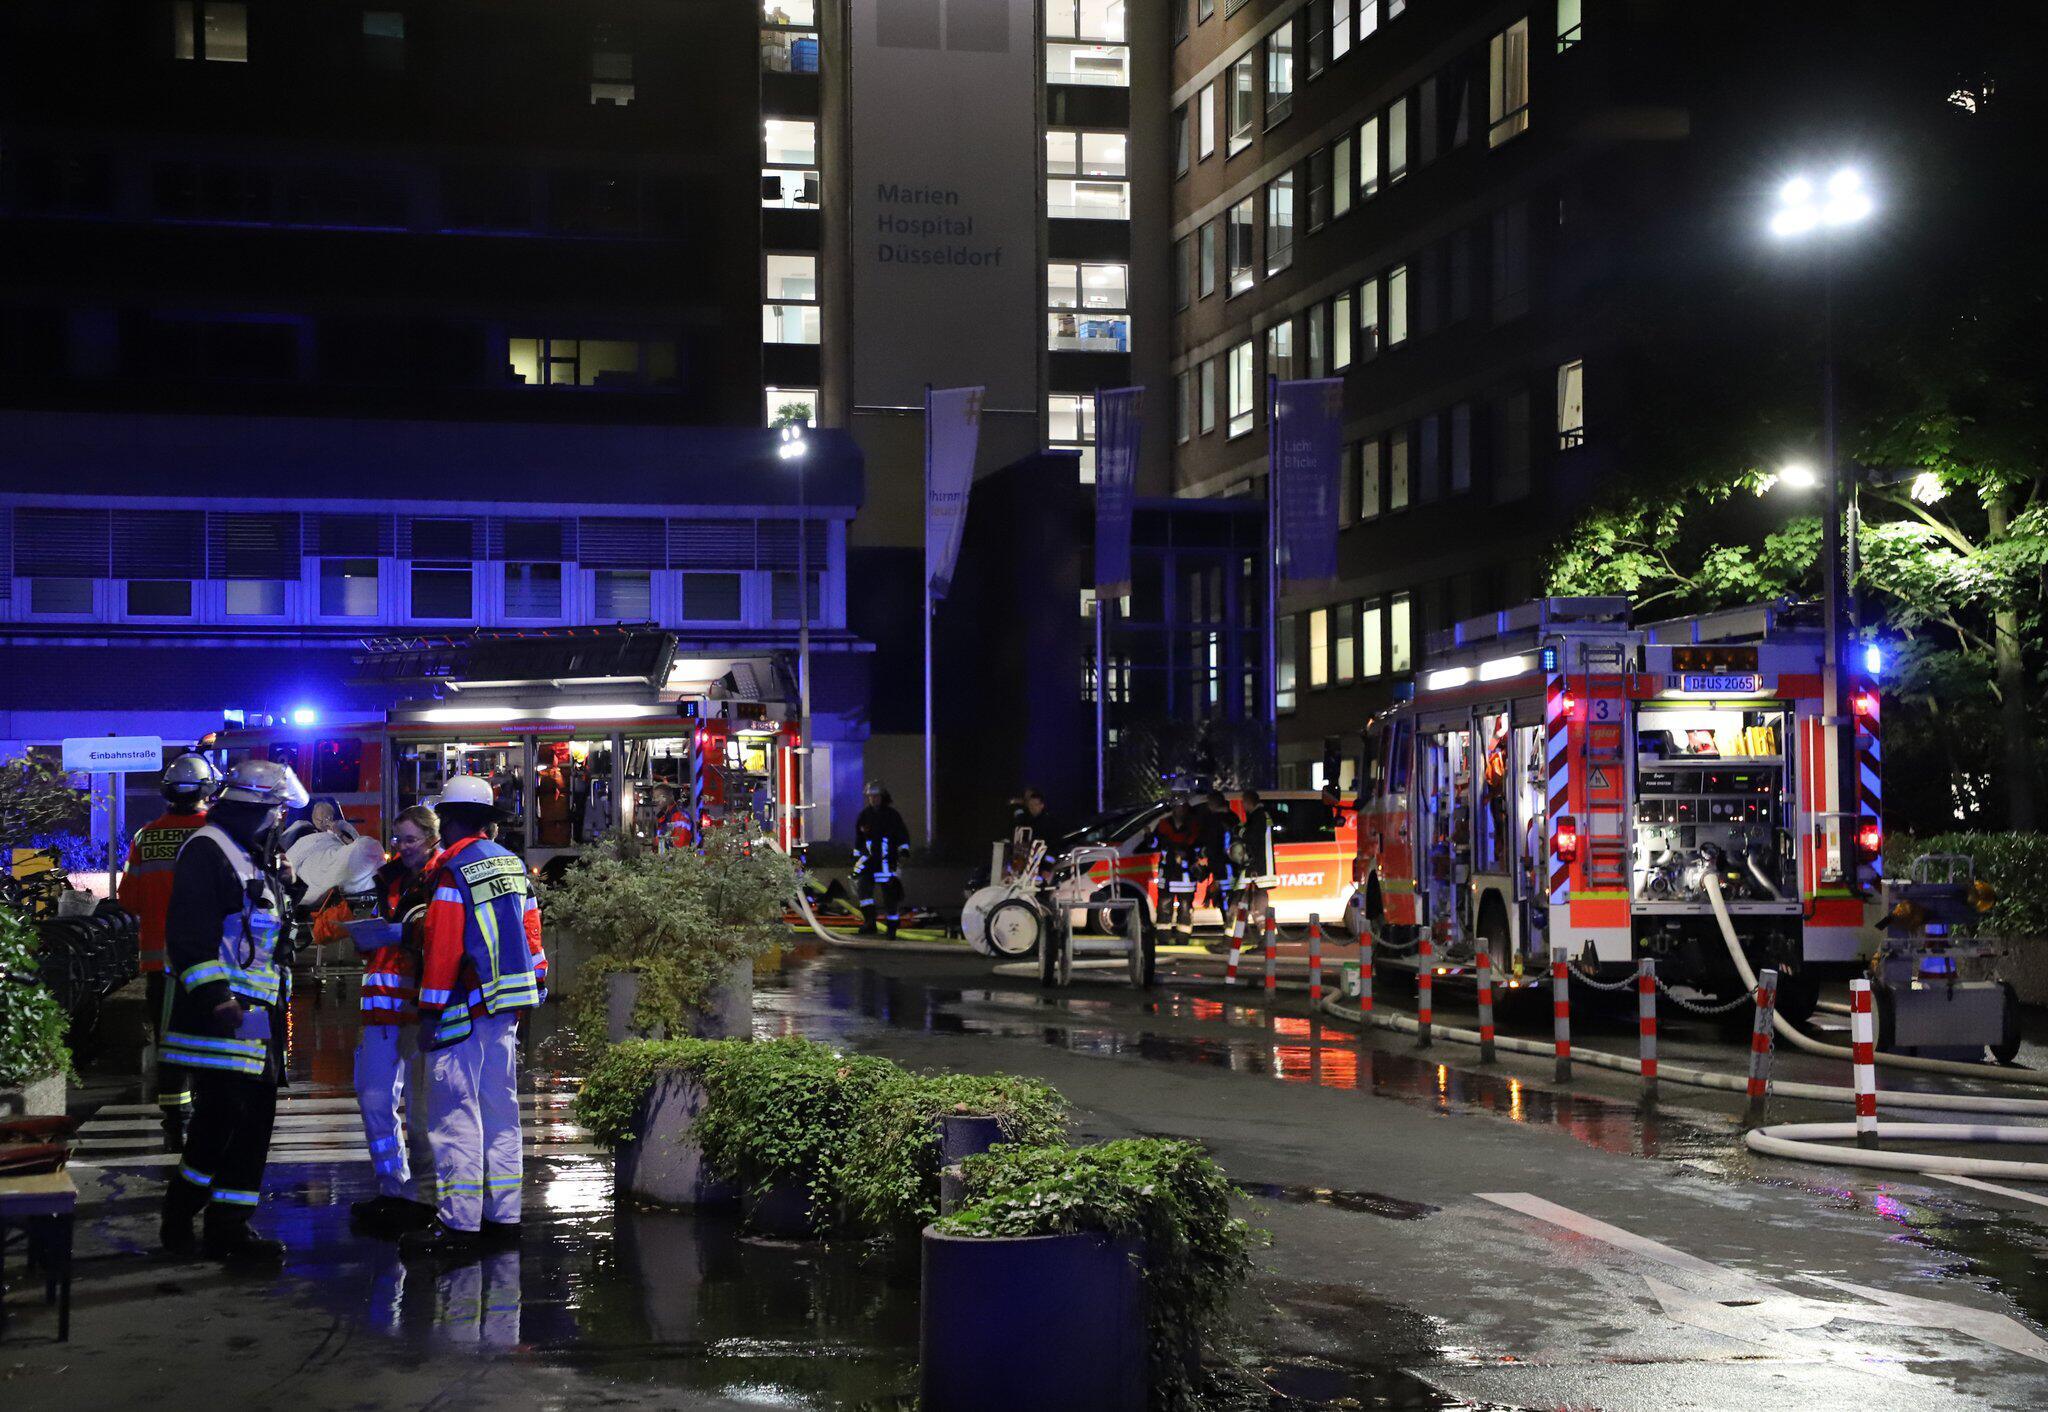 Bild zu Brand im Marien Hospital Düsseldorf